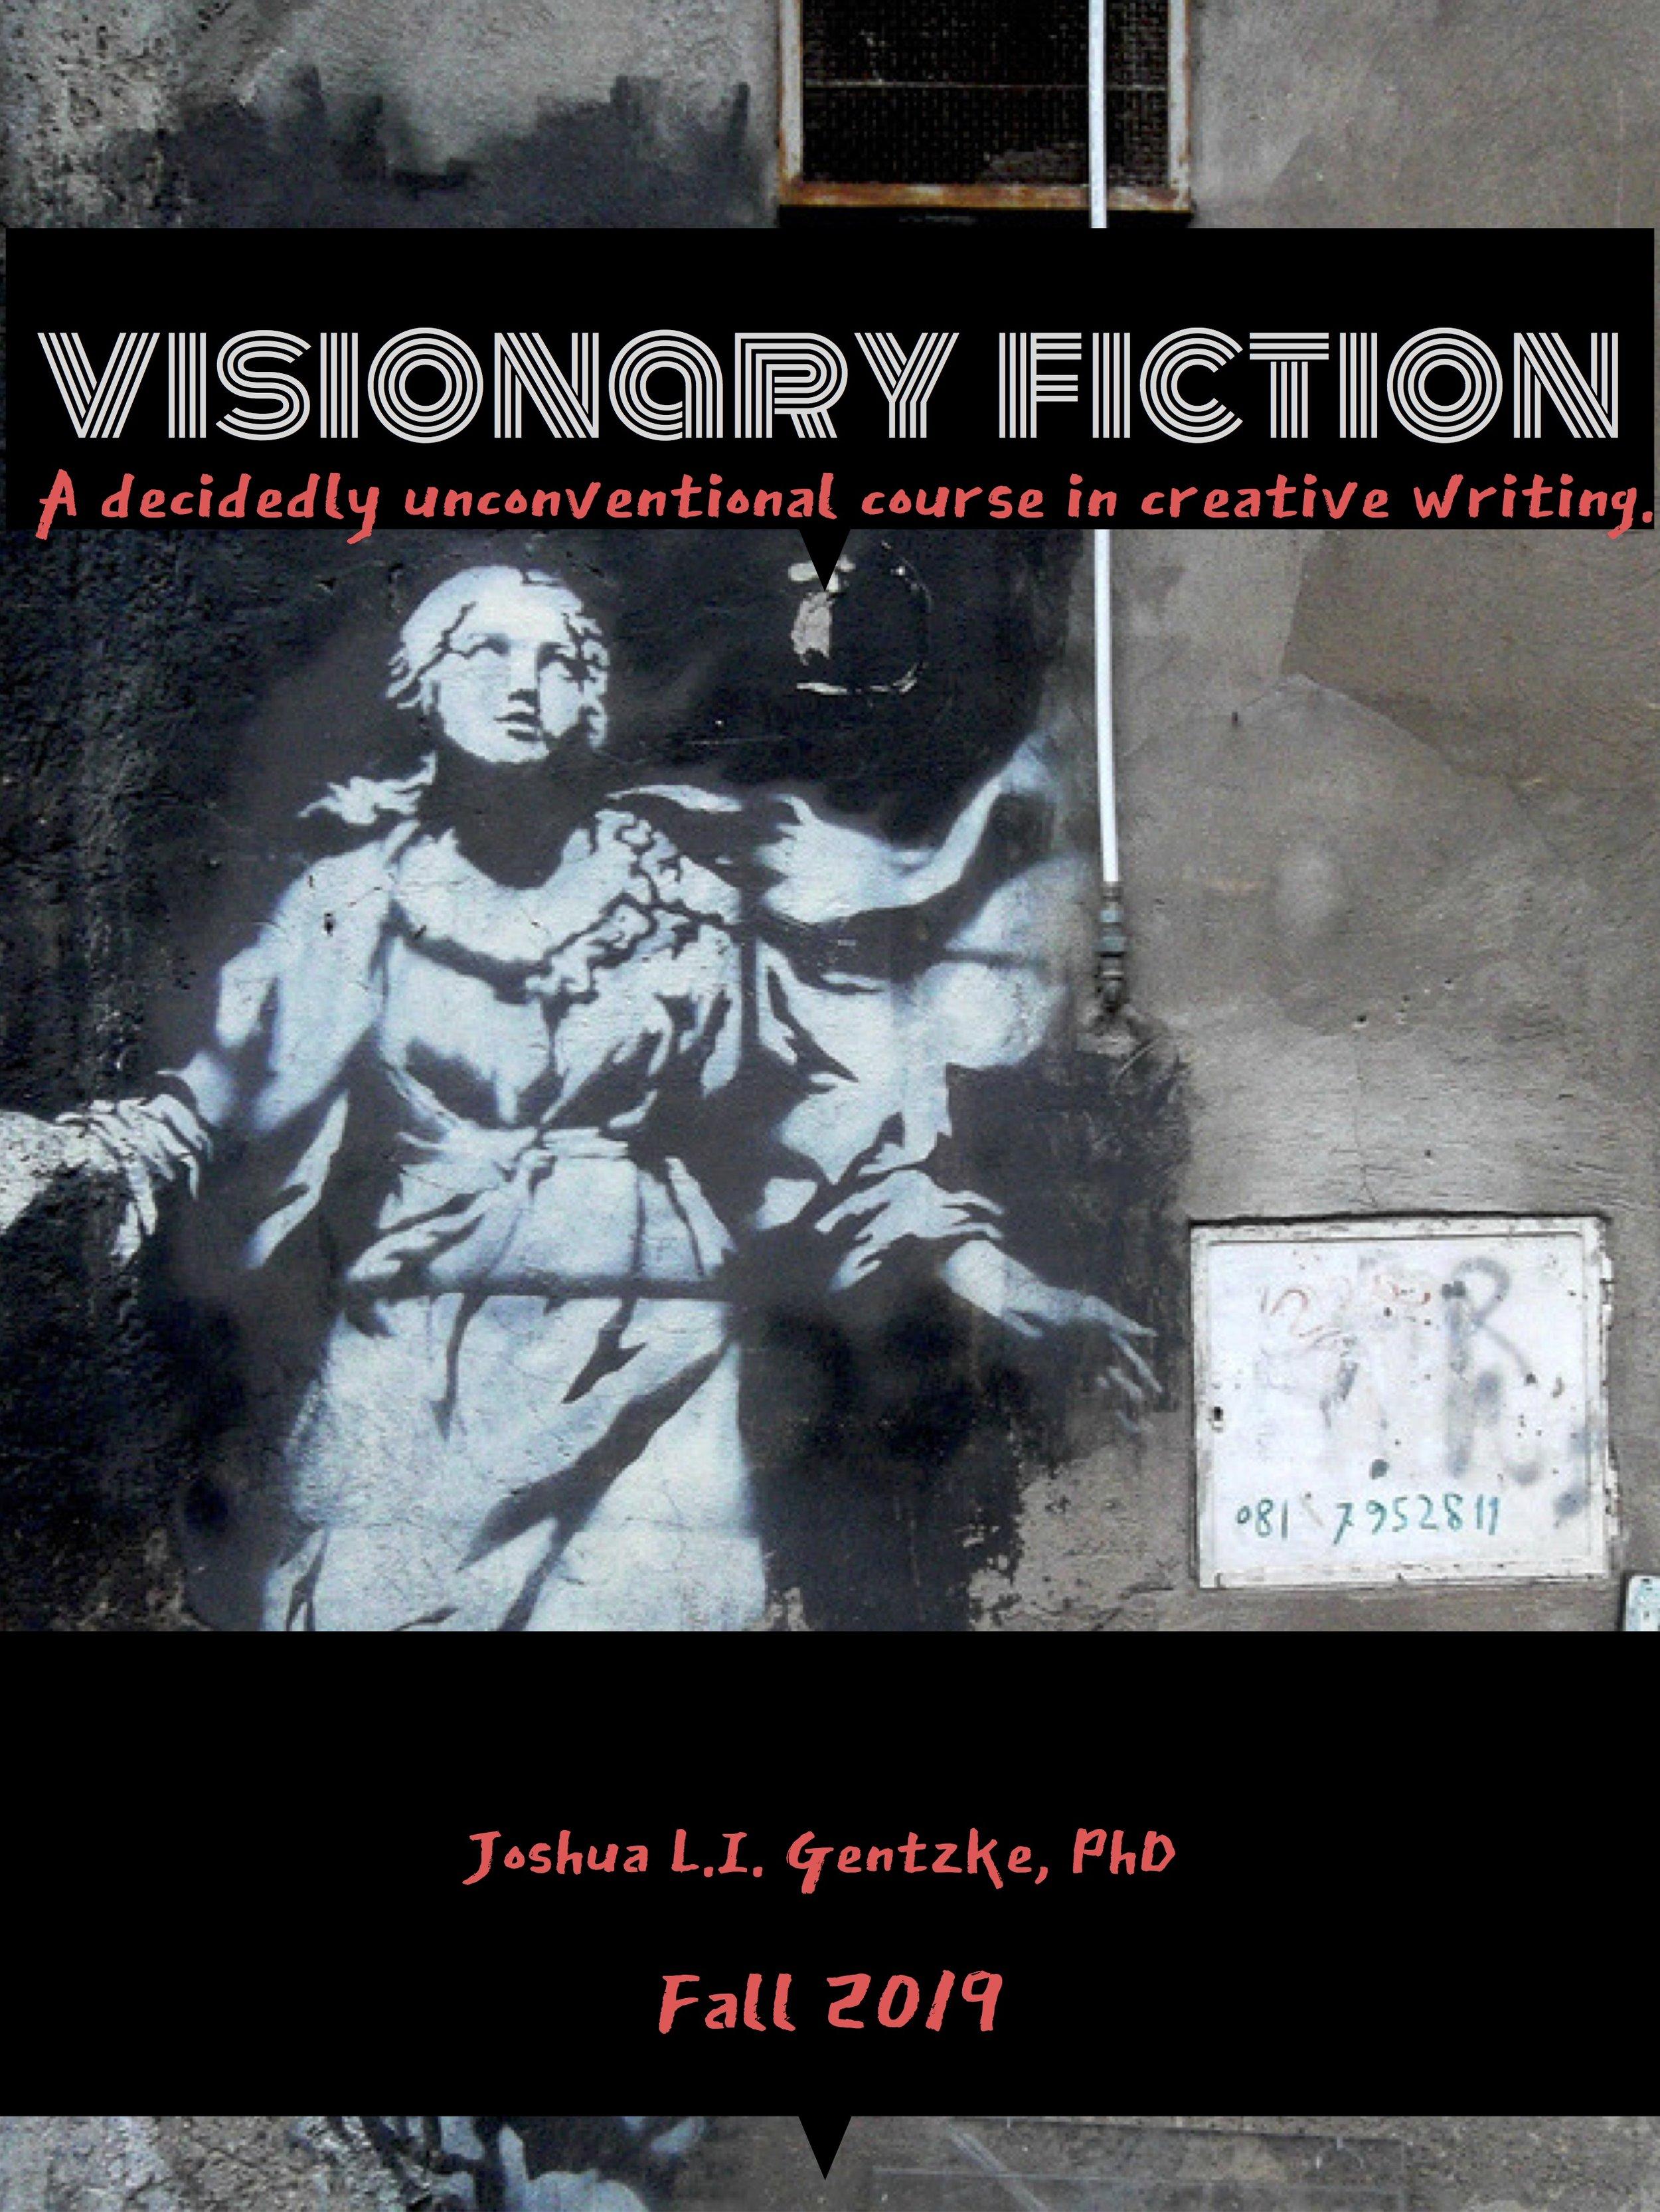 visionary fiction - poster #1.jpg